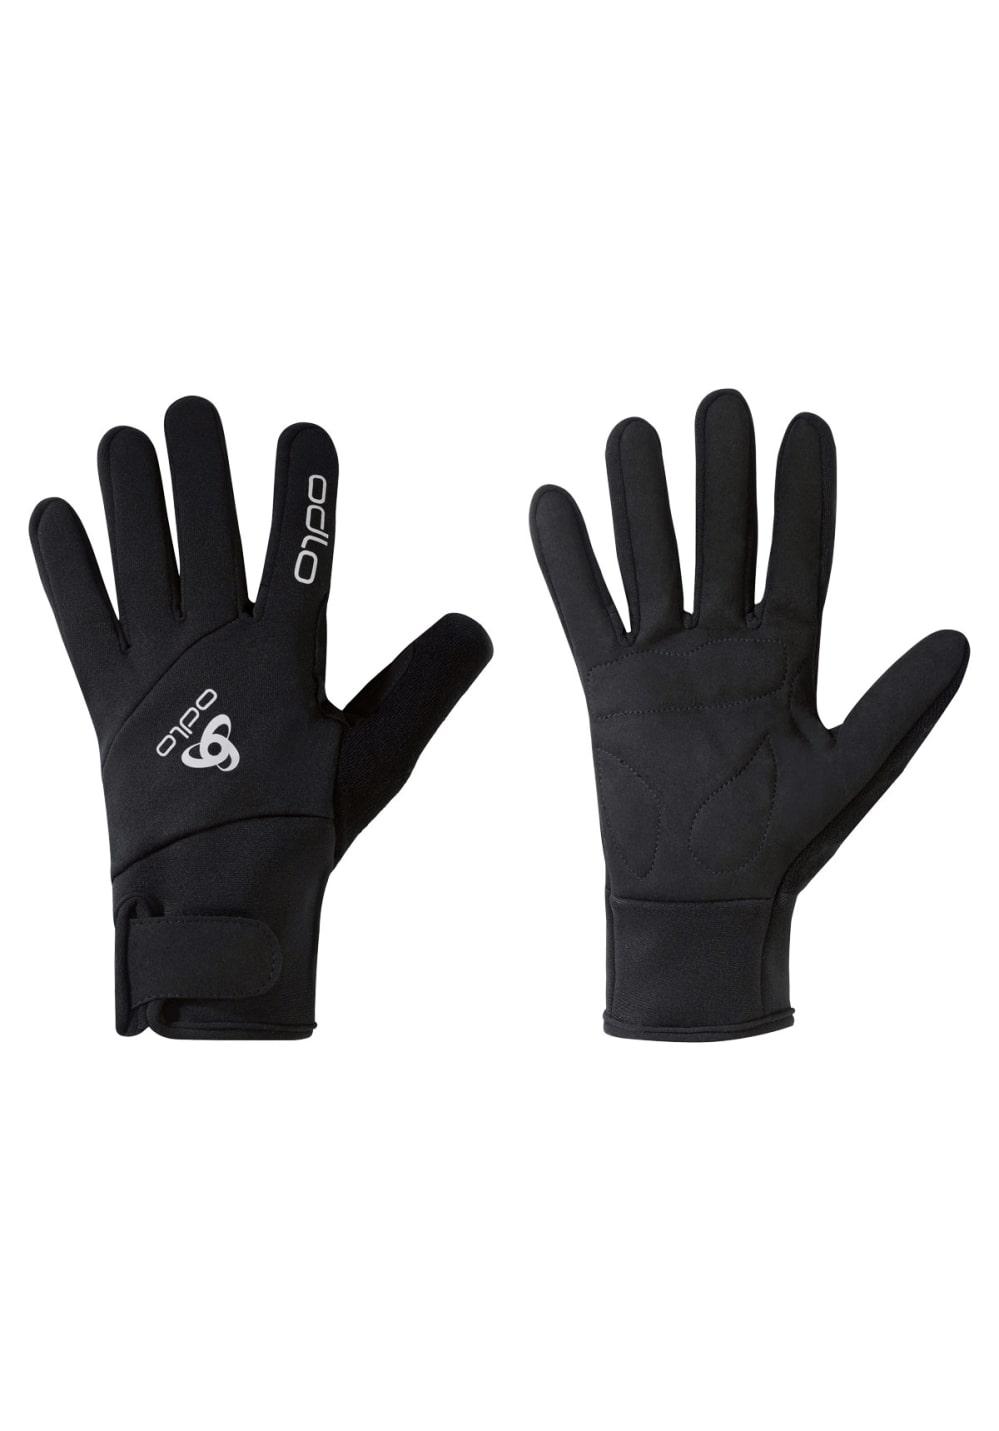 Odlo Gloves Nordic Active Laufhandschuhe - Schwarz, Gr. XXS